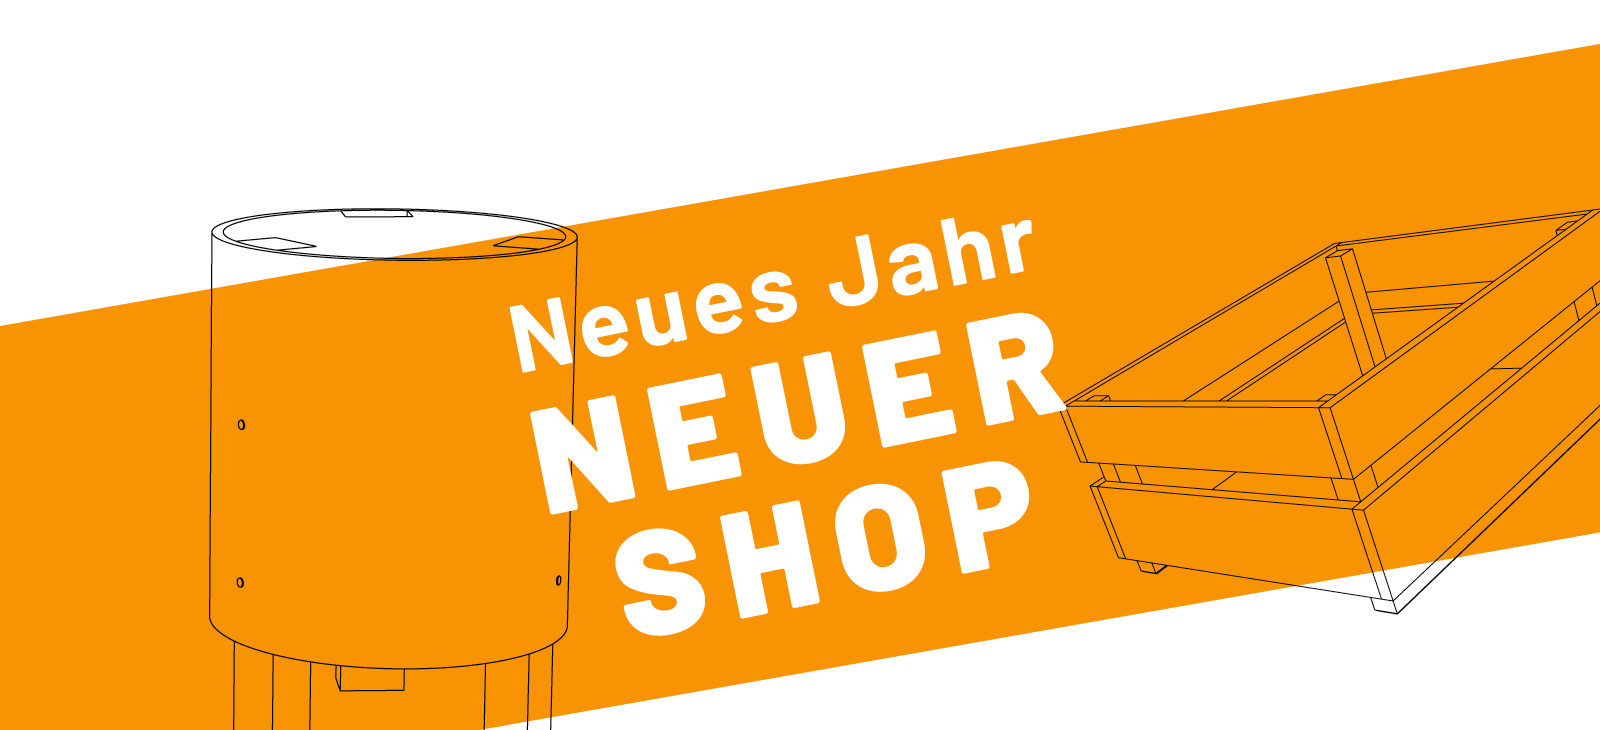 190107_upcyclingzentrum_Shoponline_website_neu18